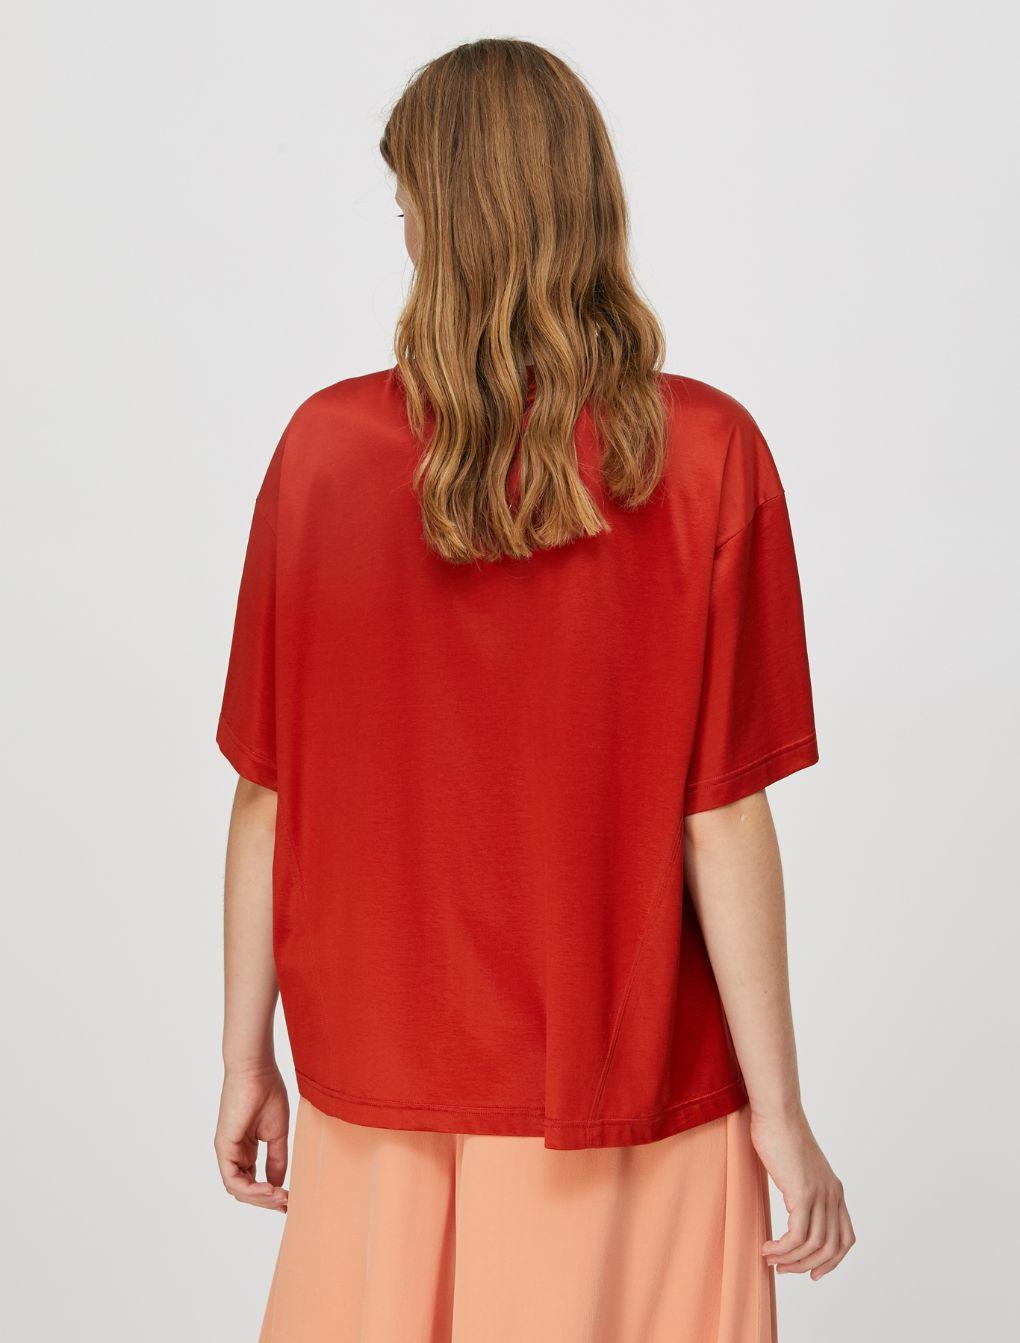 DARIA T-shirt terracotta 2